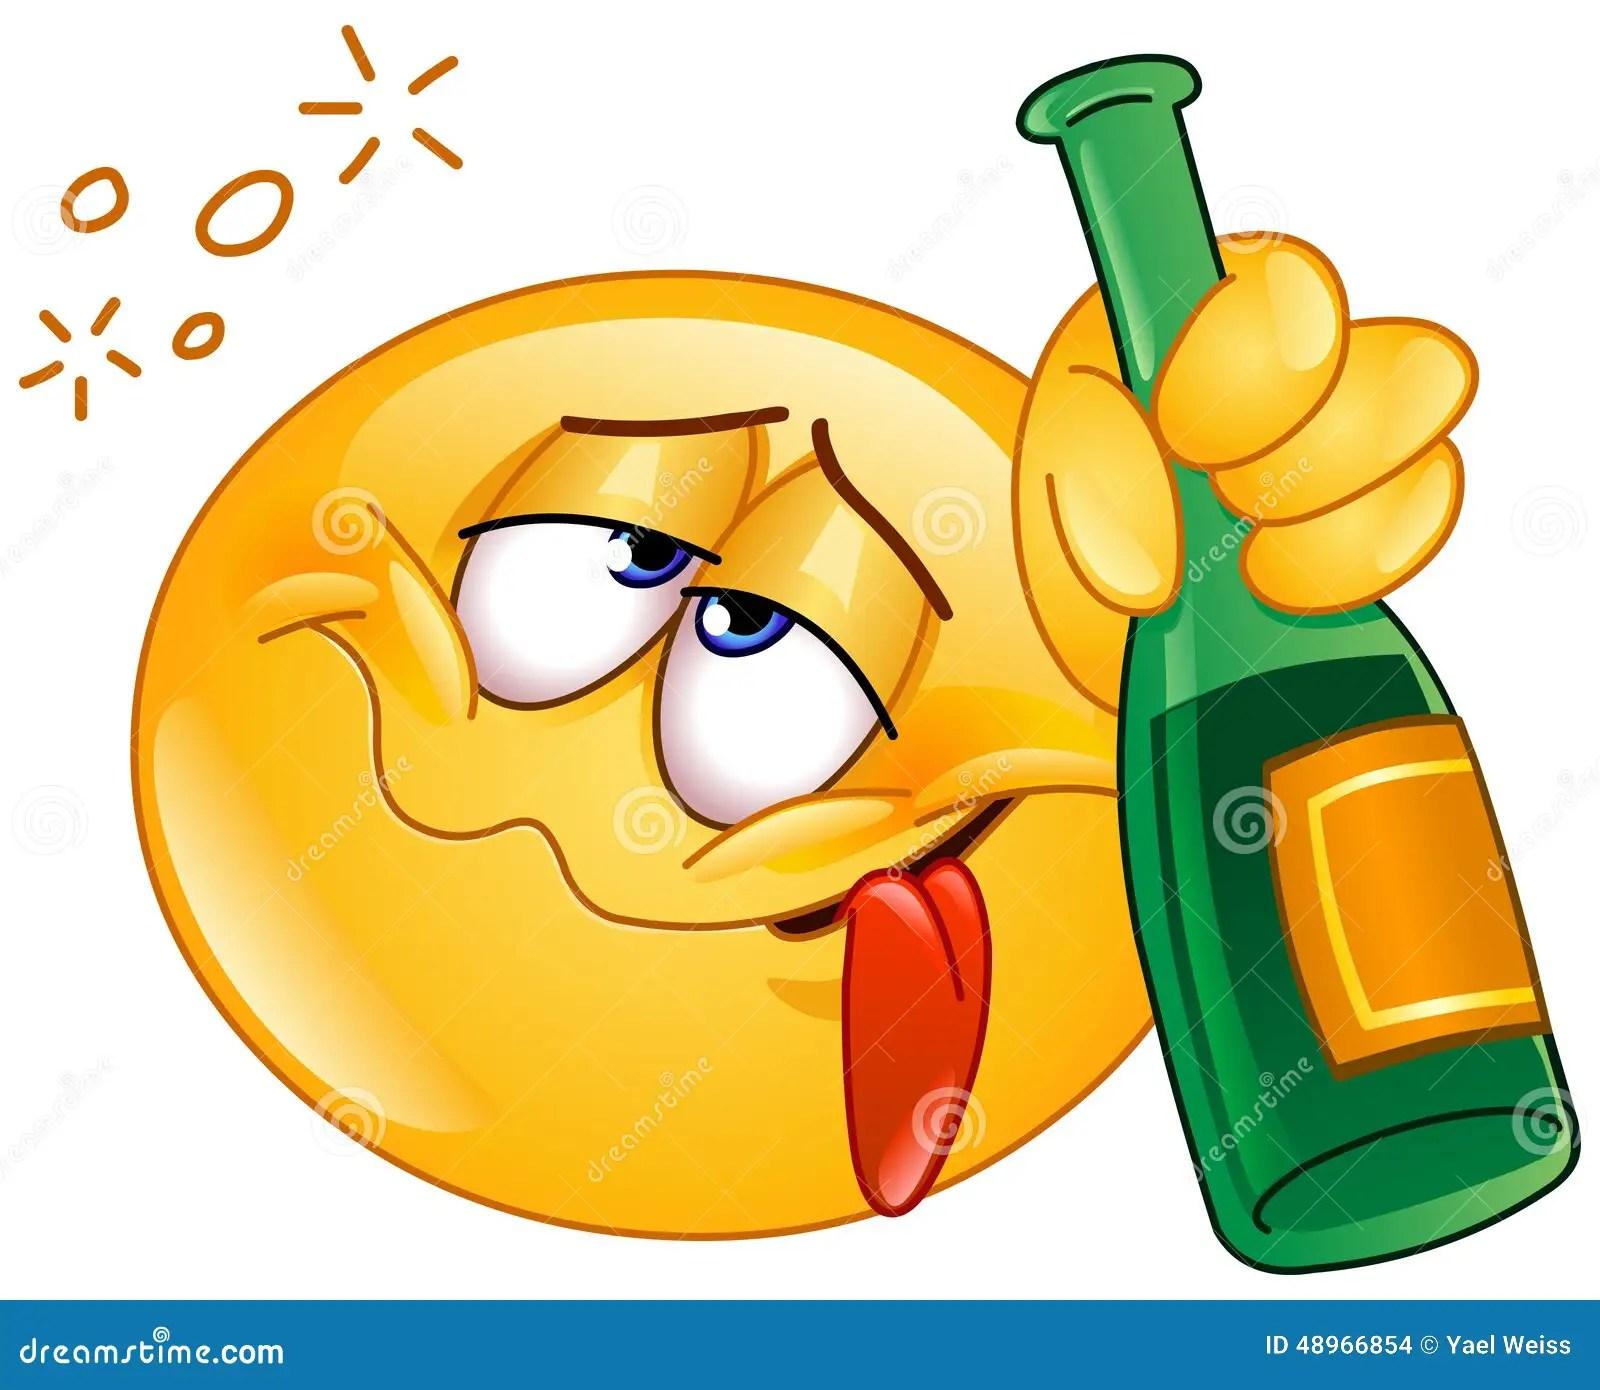 hight resolution of drunk emoticon